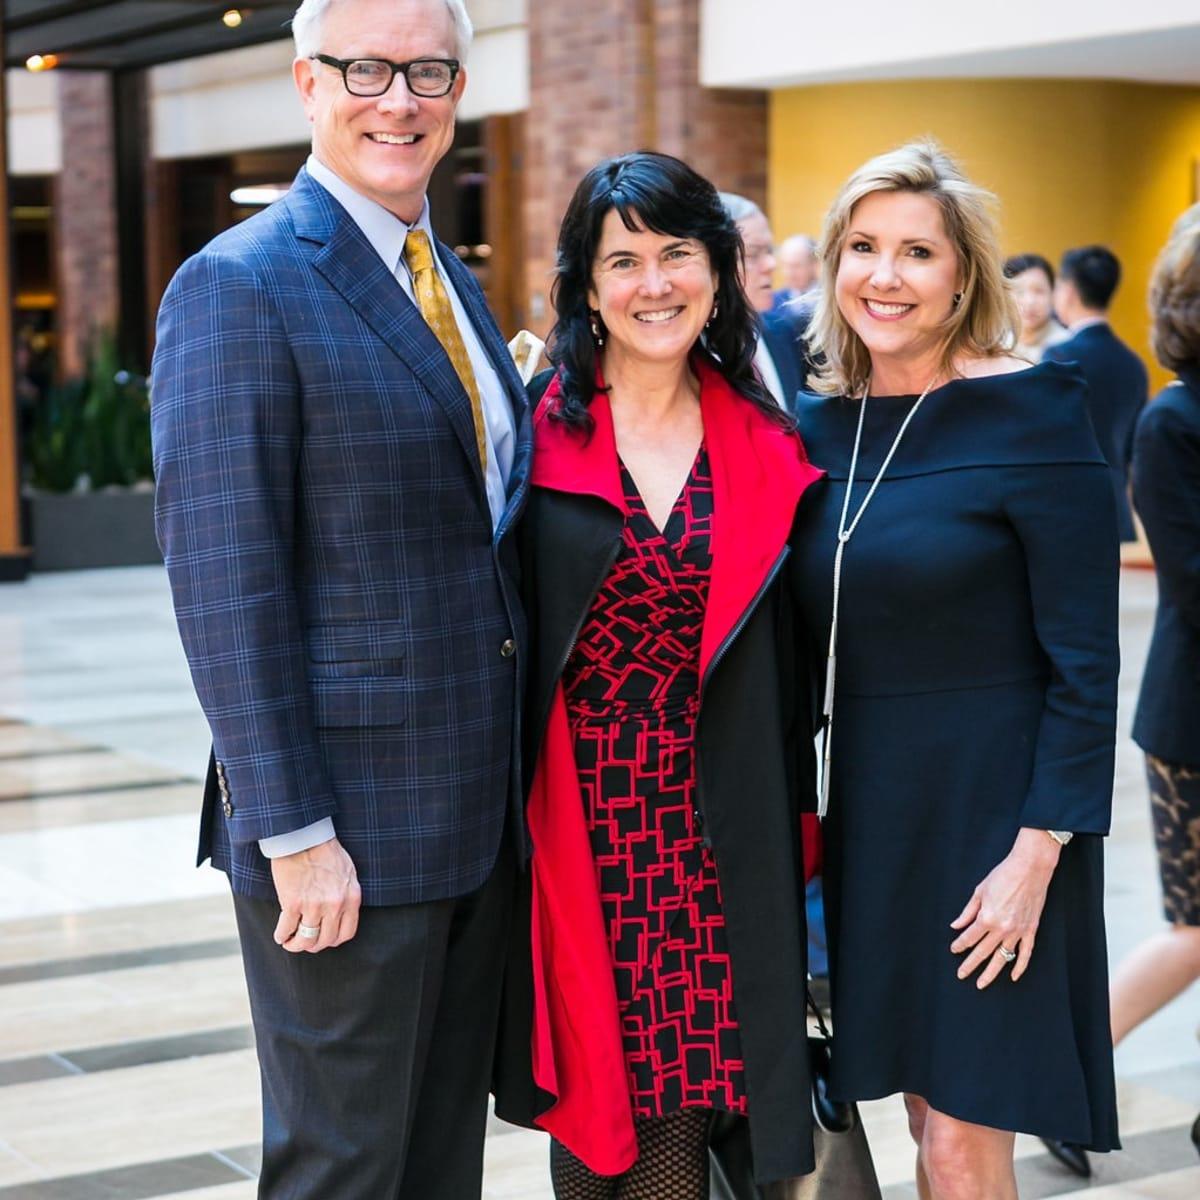 TACA silver cup luncheon 2018, Nick Even, Tara Lewis, Kirsten Rettig